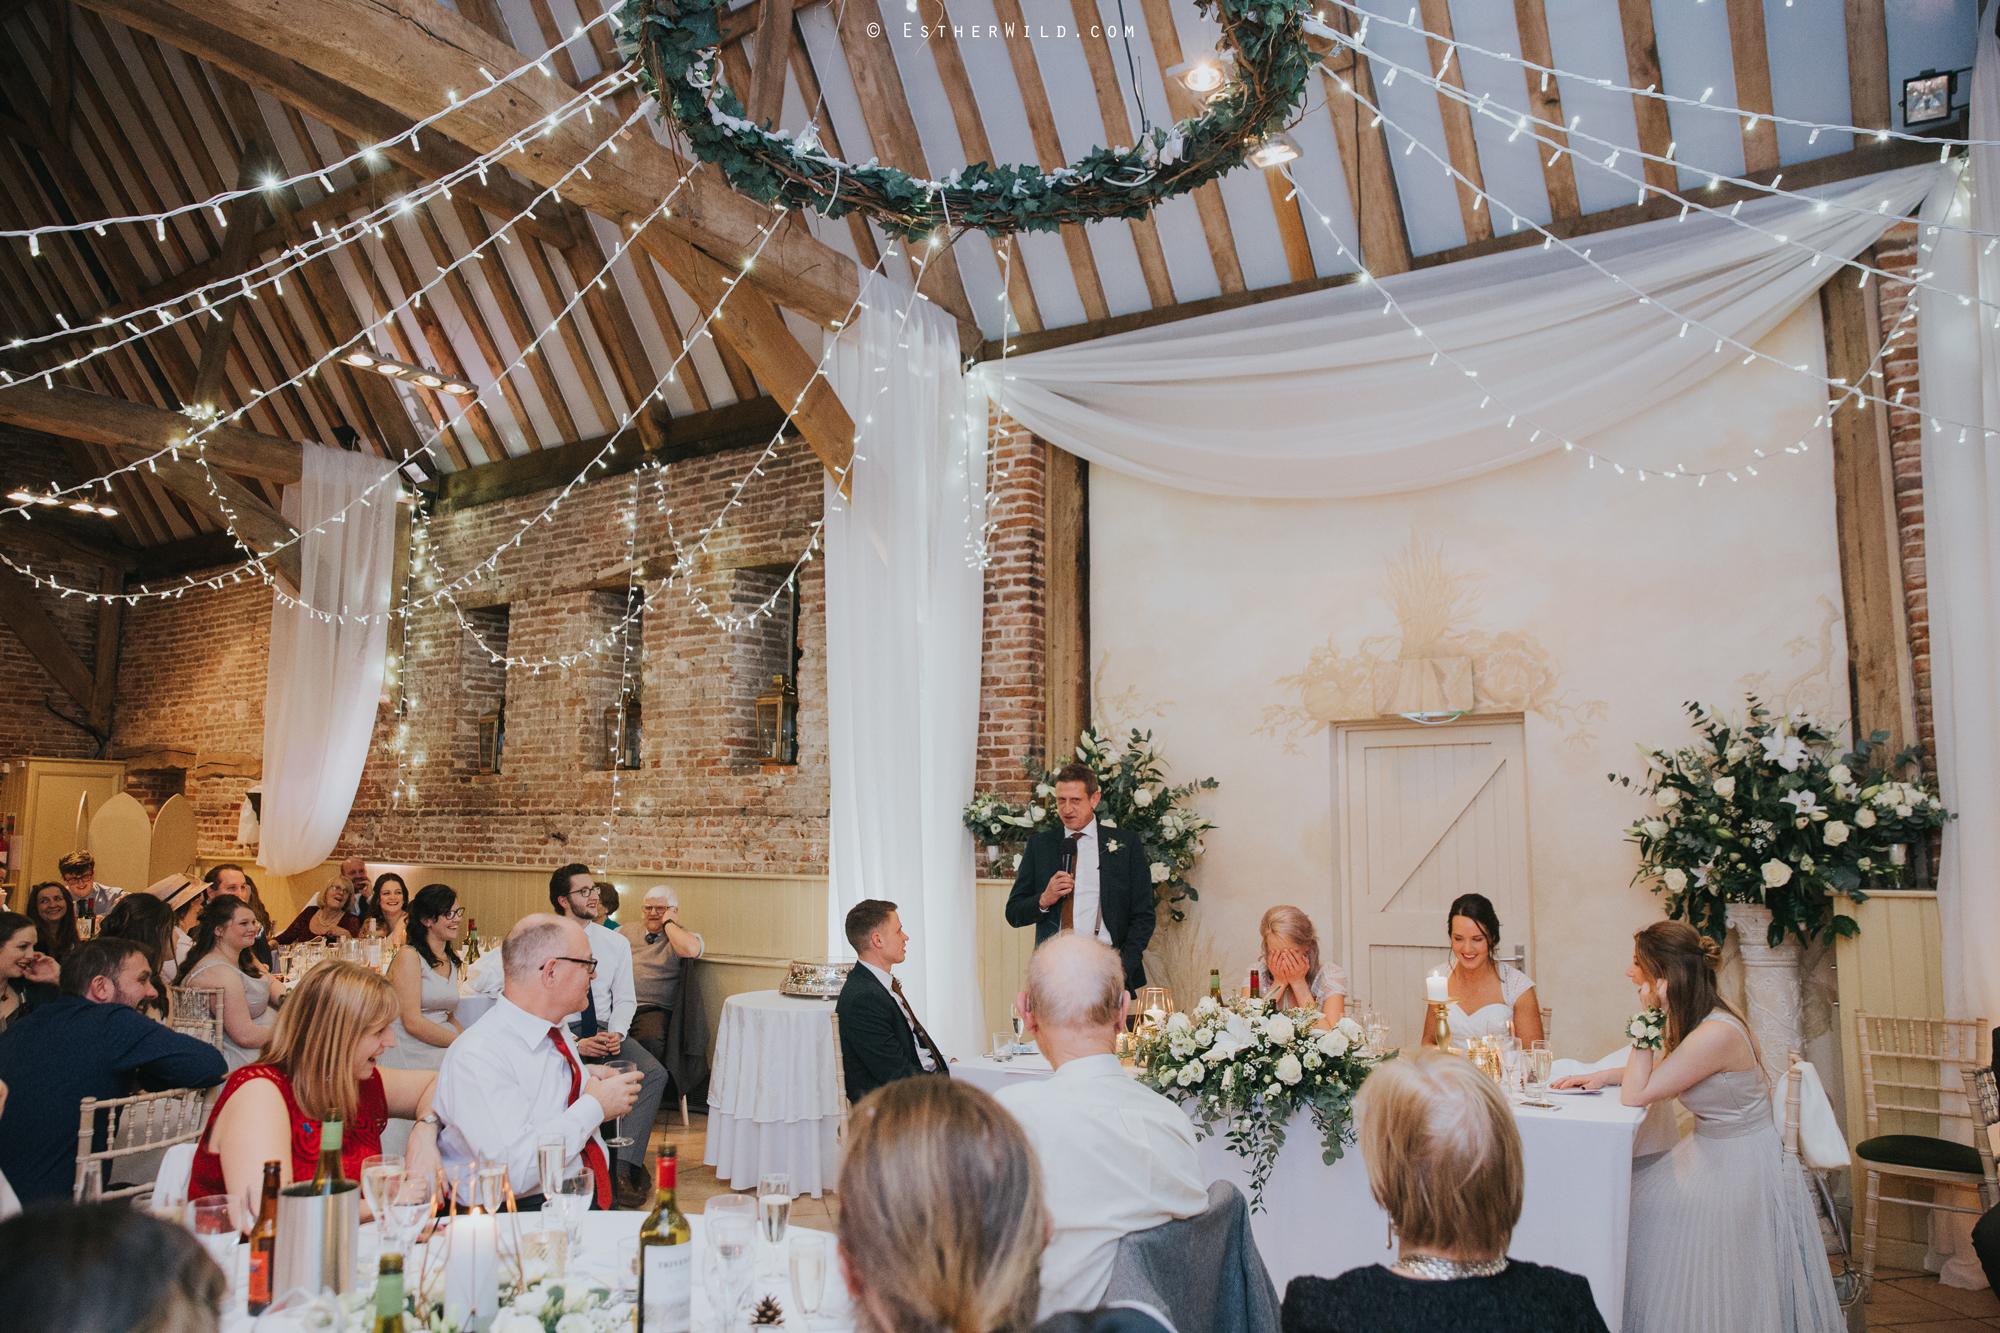 Elms_Barn_Weddings_Suffolk_Photographer_Copyright_Esther_Wild_IMG_2617.jpg